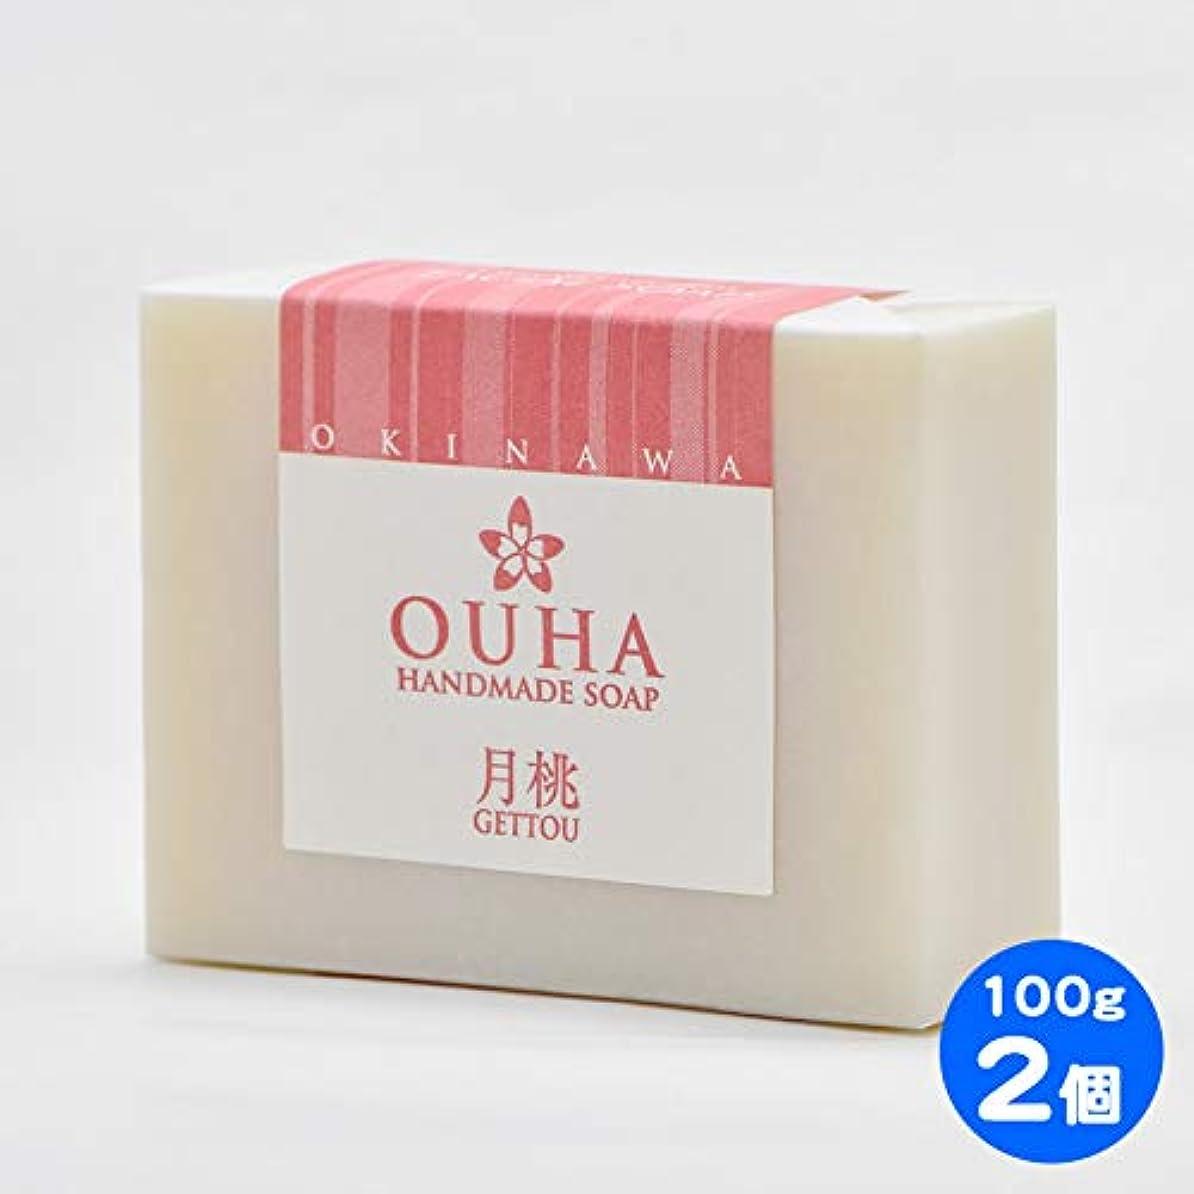 葉懐疑的収入【送料無料 定形外郵便】沖縄県産 OUHAソープ 月桃 石鹸 100g 2個セット